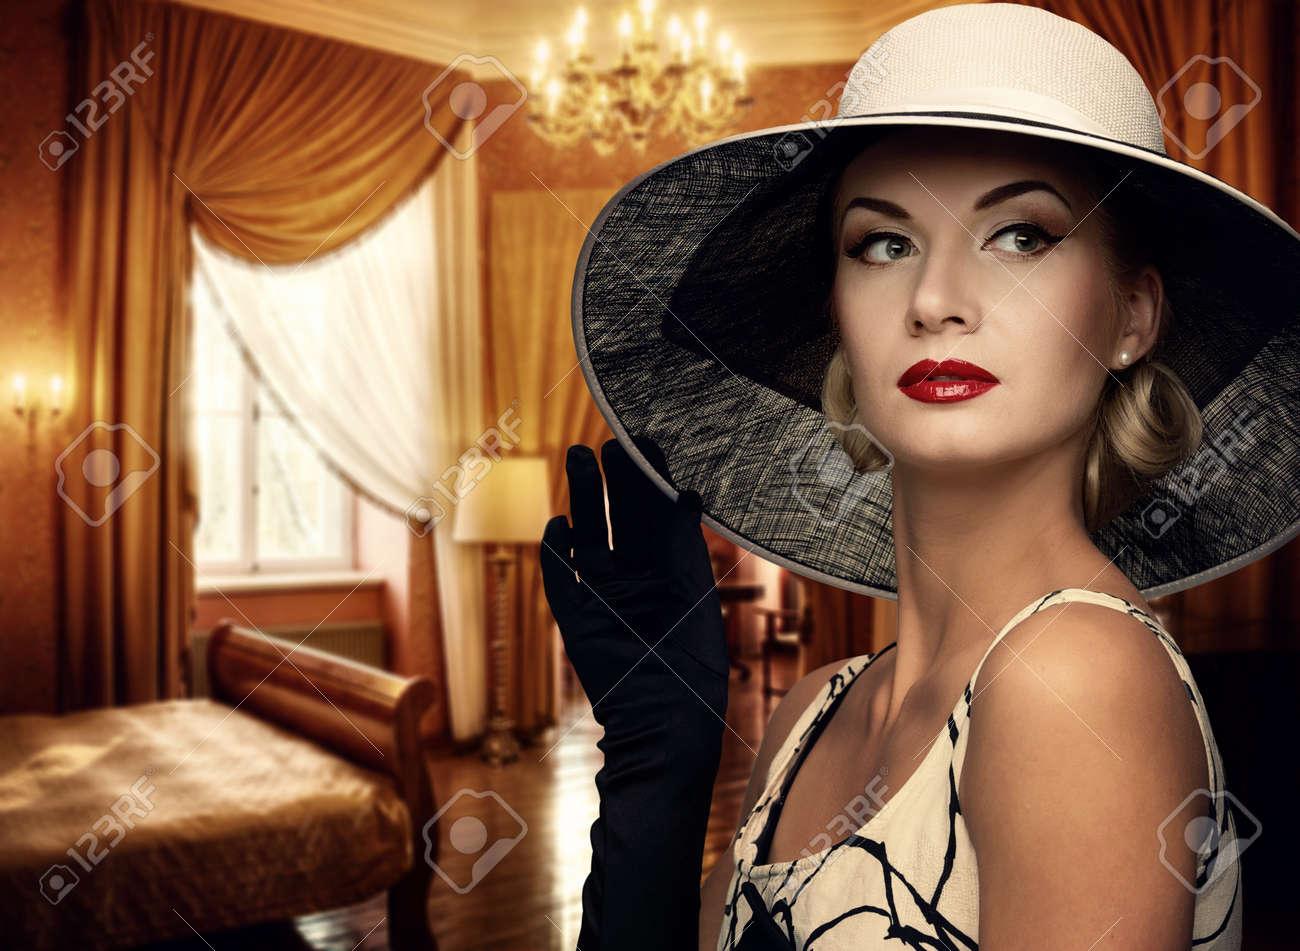 Beautiful woman in hat in luxury room. Stock Photo - 12164948